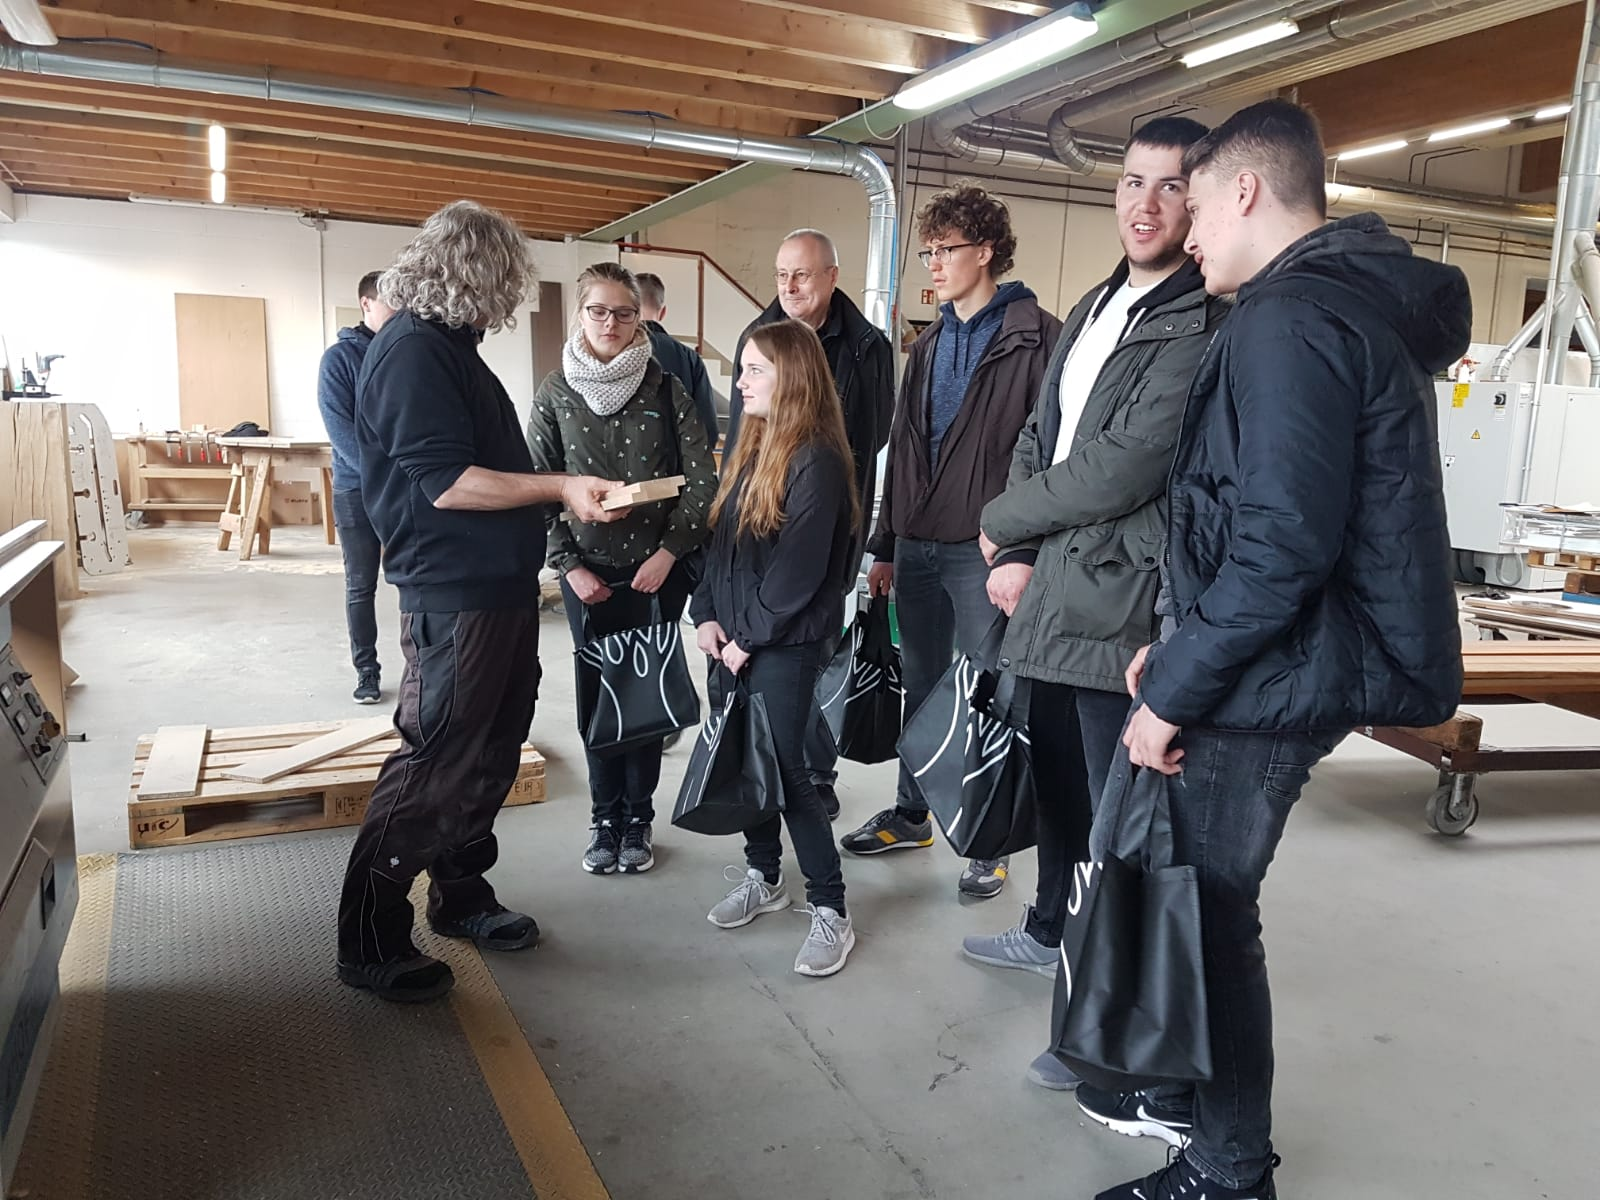 Betriebsschnuppertag bei Holz-Hauff GmbH in Leingarten